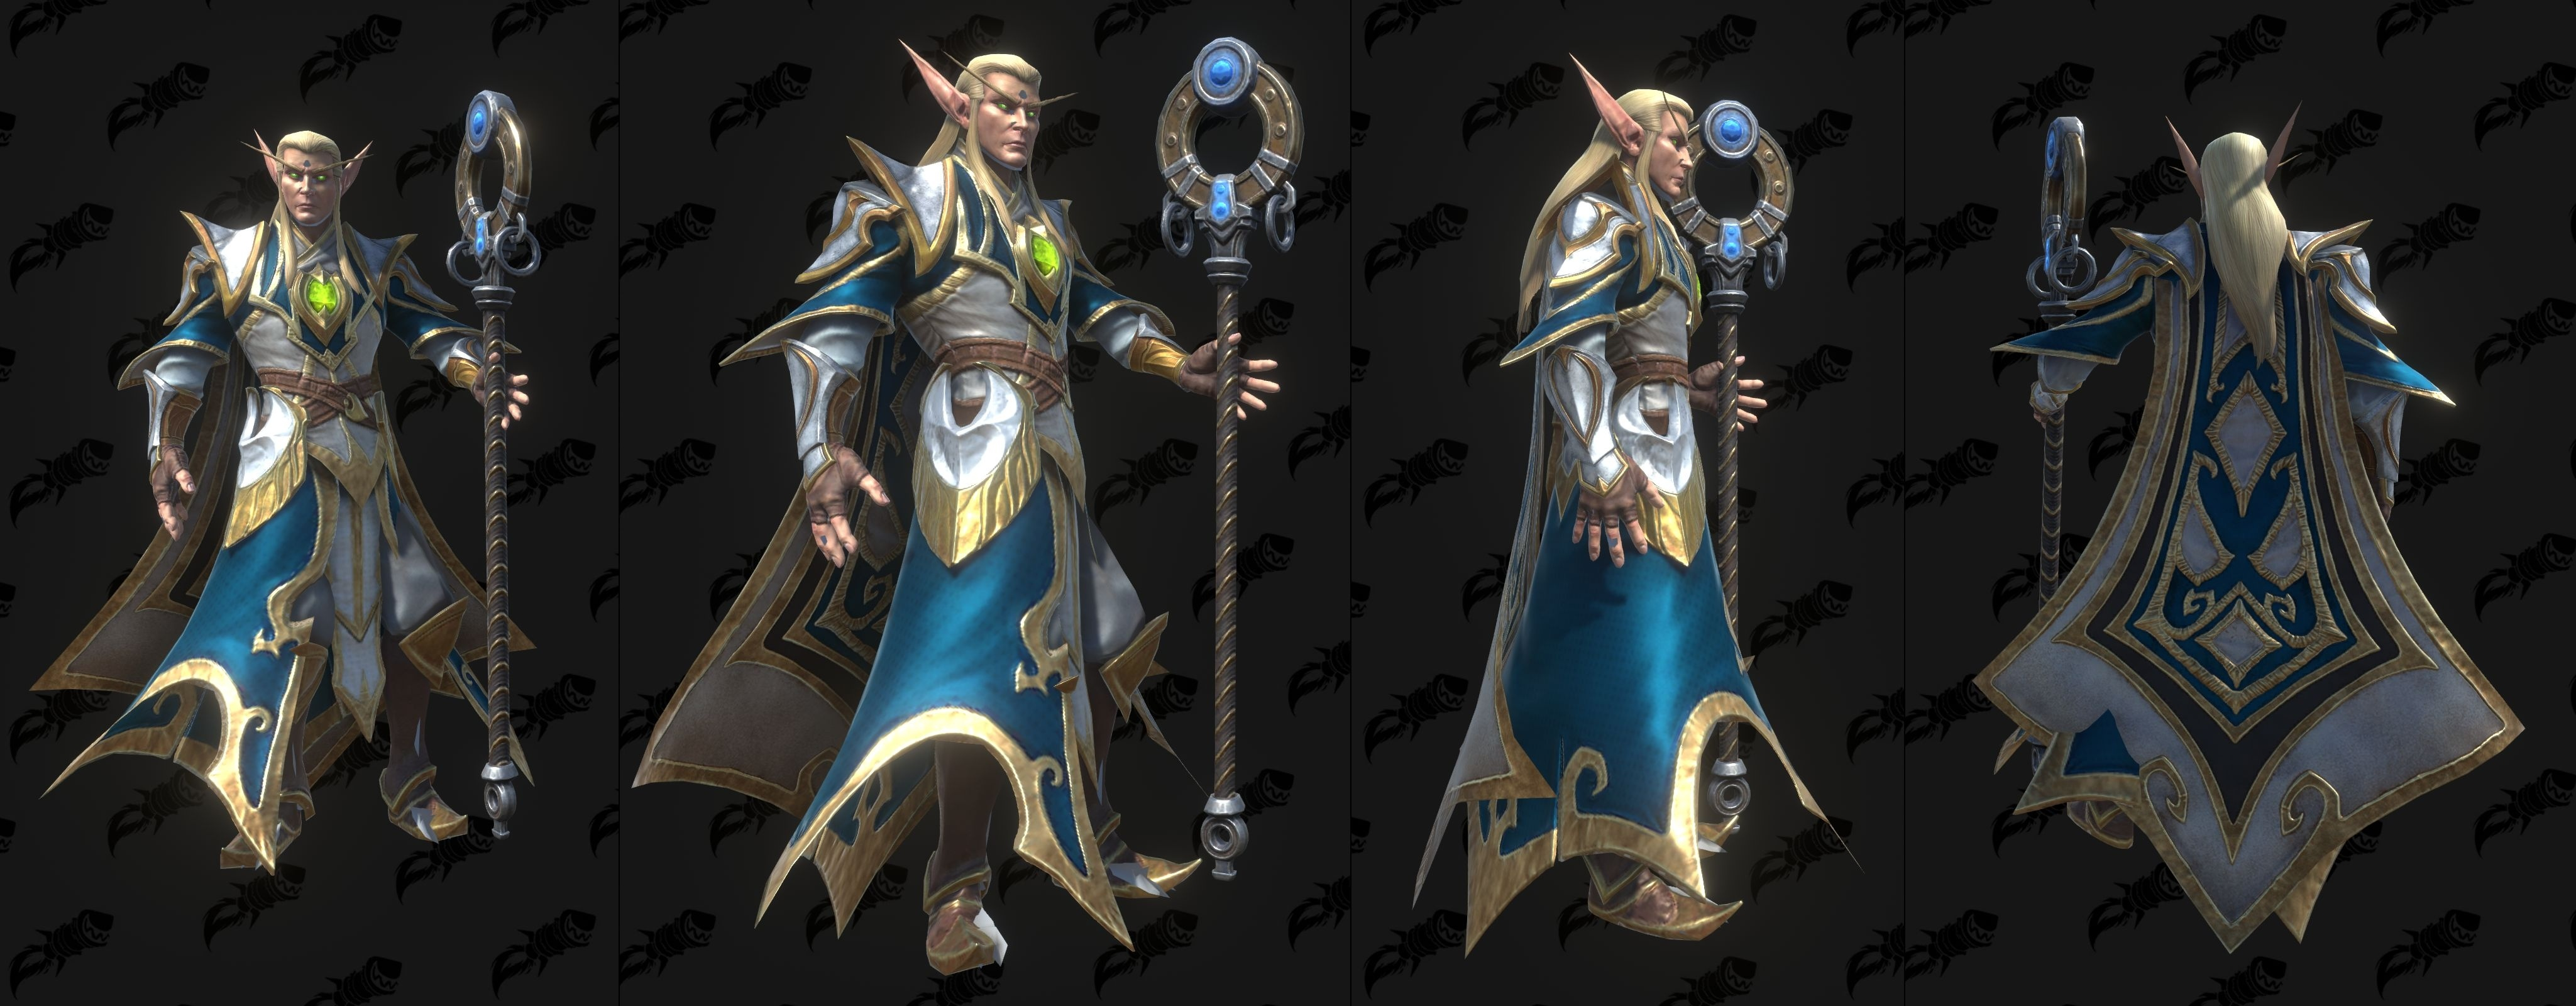 Warcraft Iii Reforged High Elf And Blood Elf Models Sylvanas